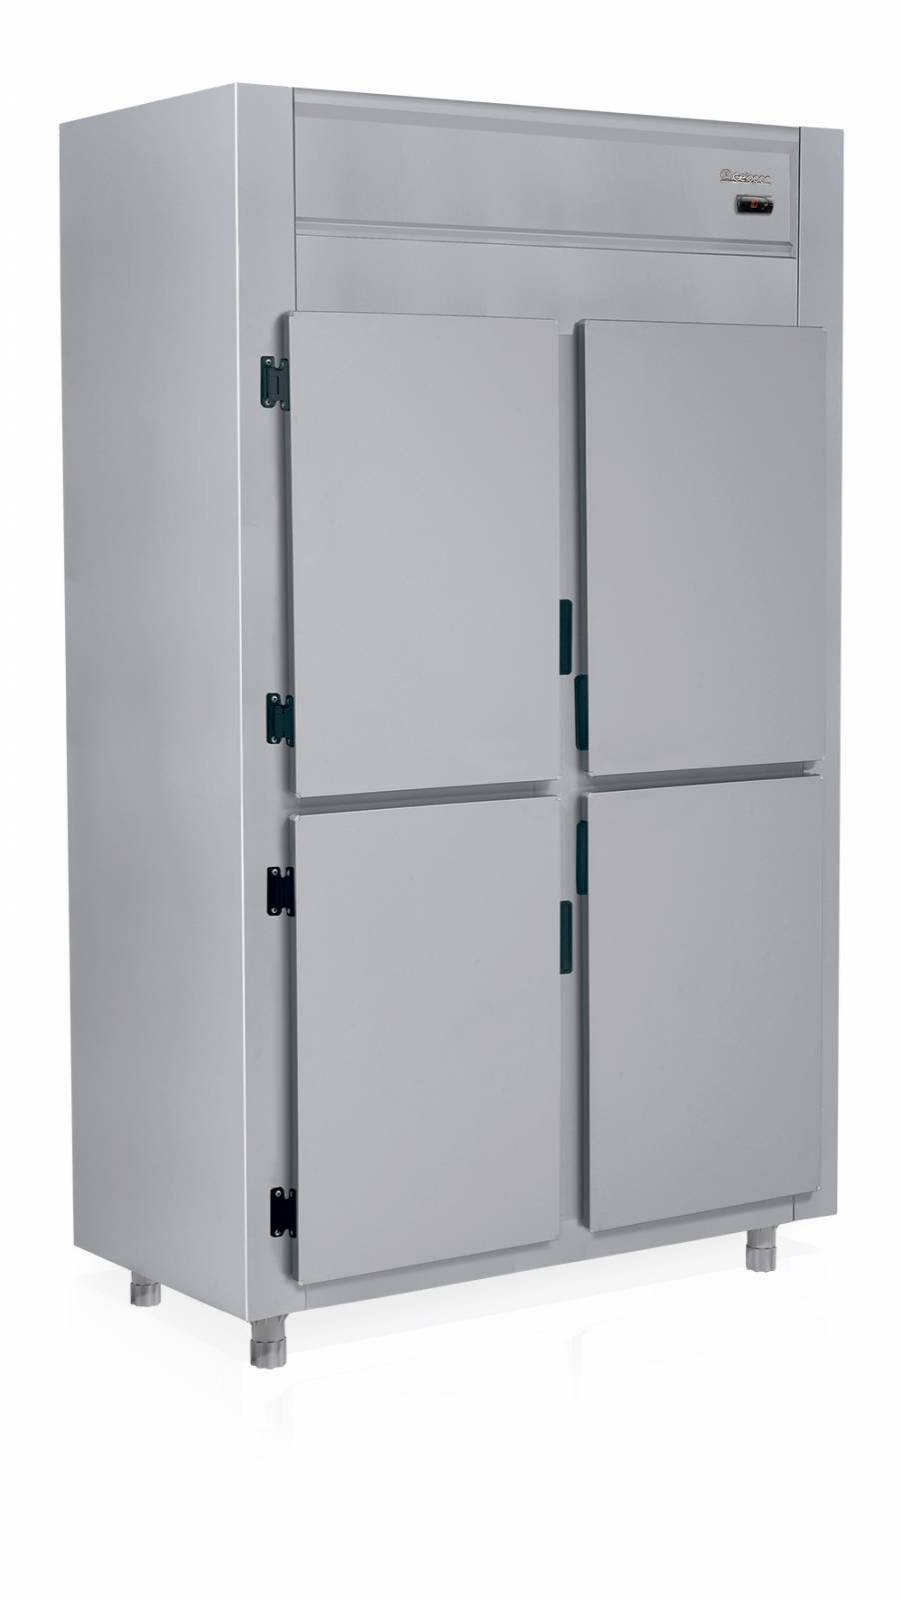 Geladeira Comercial GREP 4- Portas Cegas - C/ Controlador El